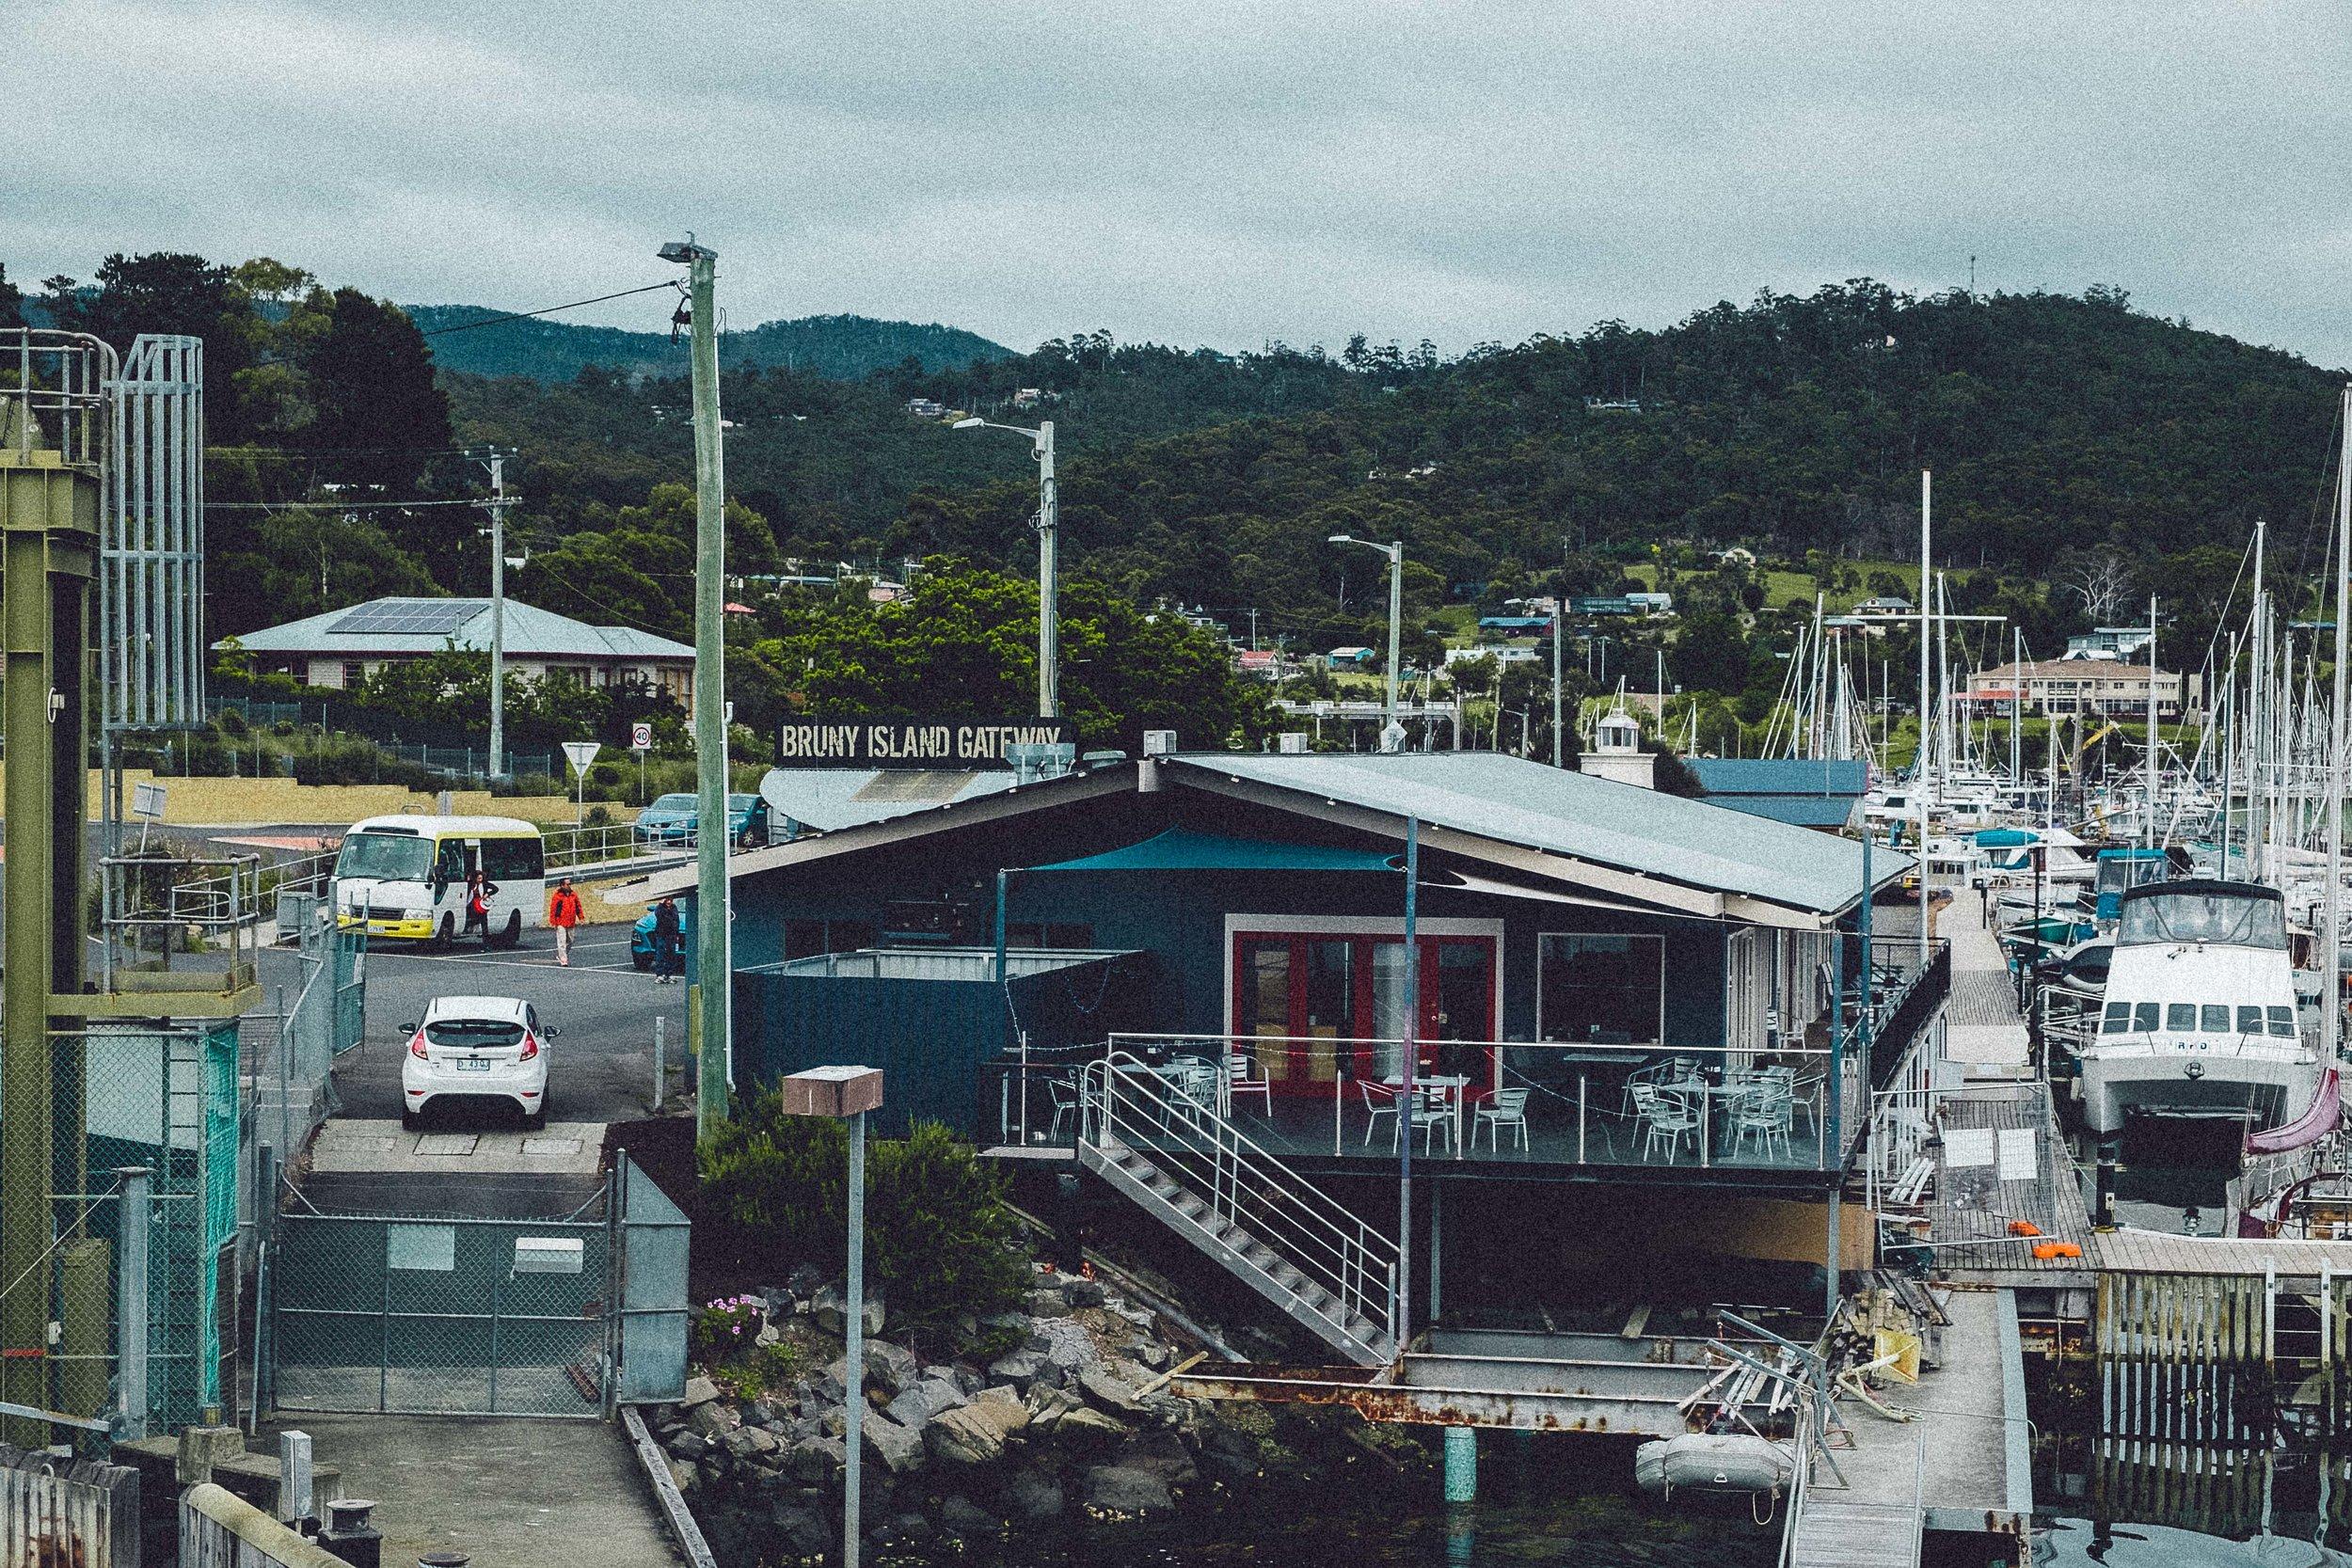 Rachel Off Duty: Bruny Island